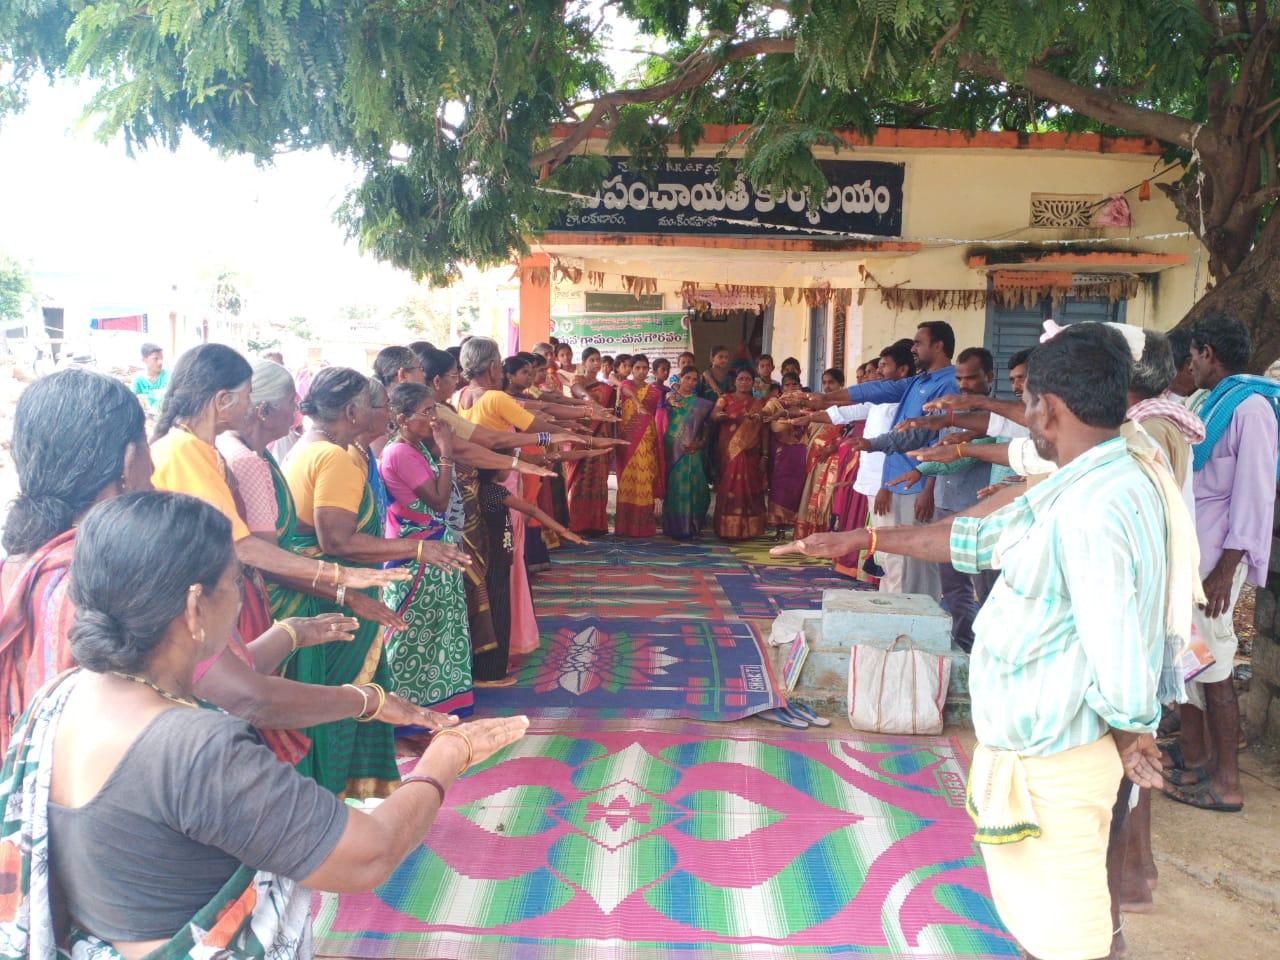 Kanduri Ailaiah |  Ailaiah | Sarpanch | Vice-Sarpanch | District Secretary | MPTC | Active Member | INC | TRS | Lakudaram | Kondapak | Siddipet | Gajwel | Telangana | theLeadersPage